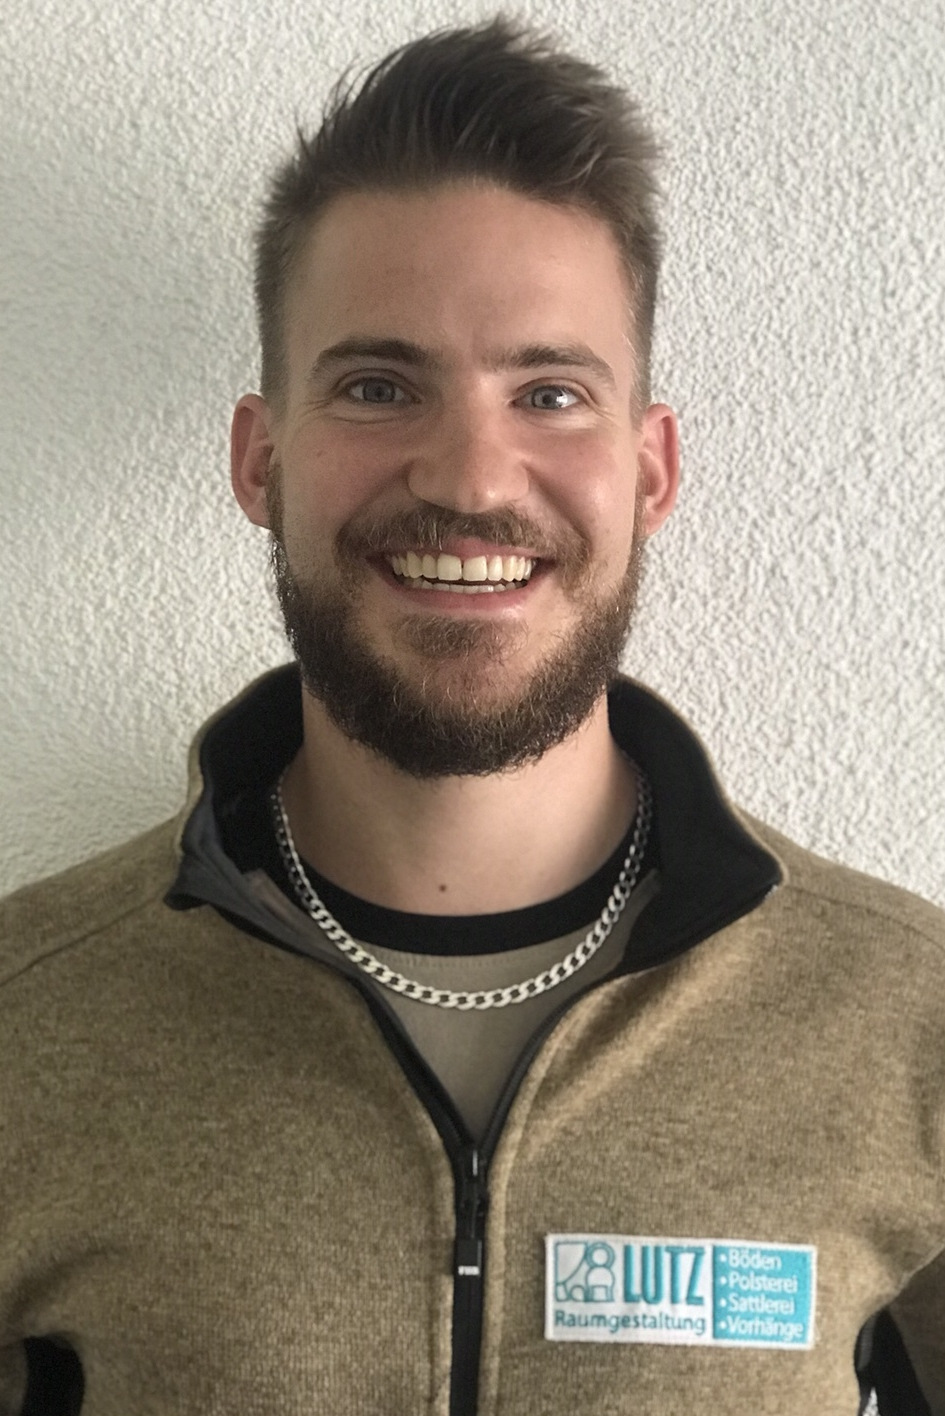 Daniel Lutz